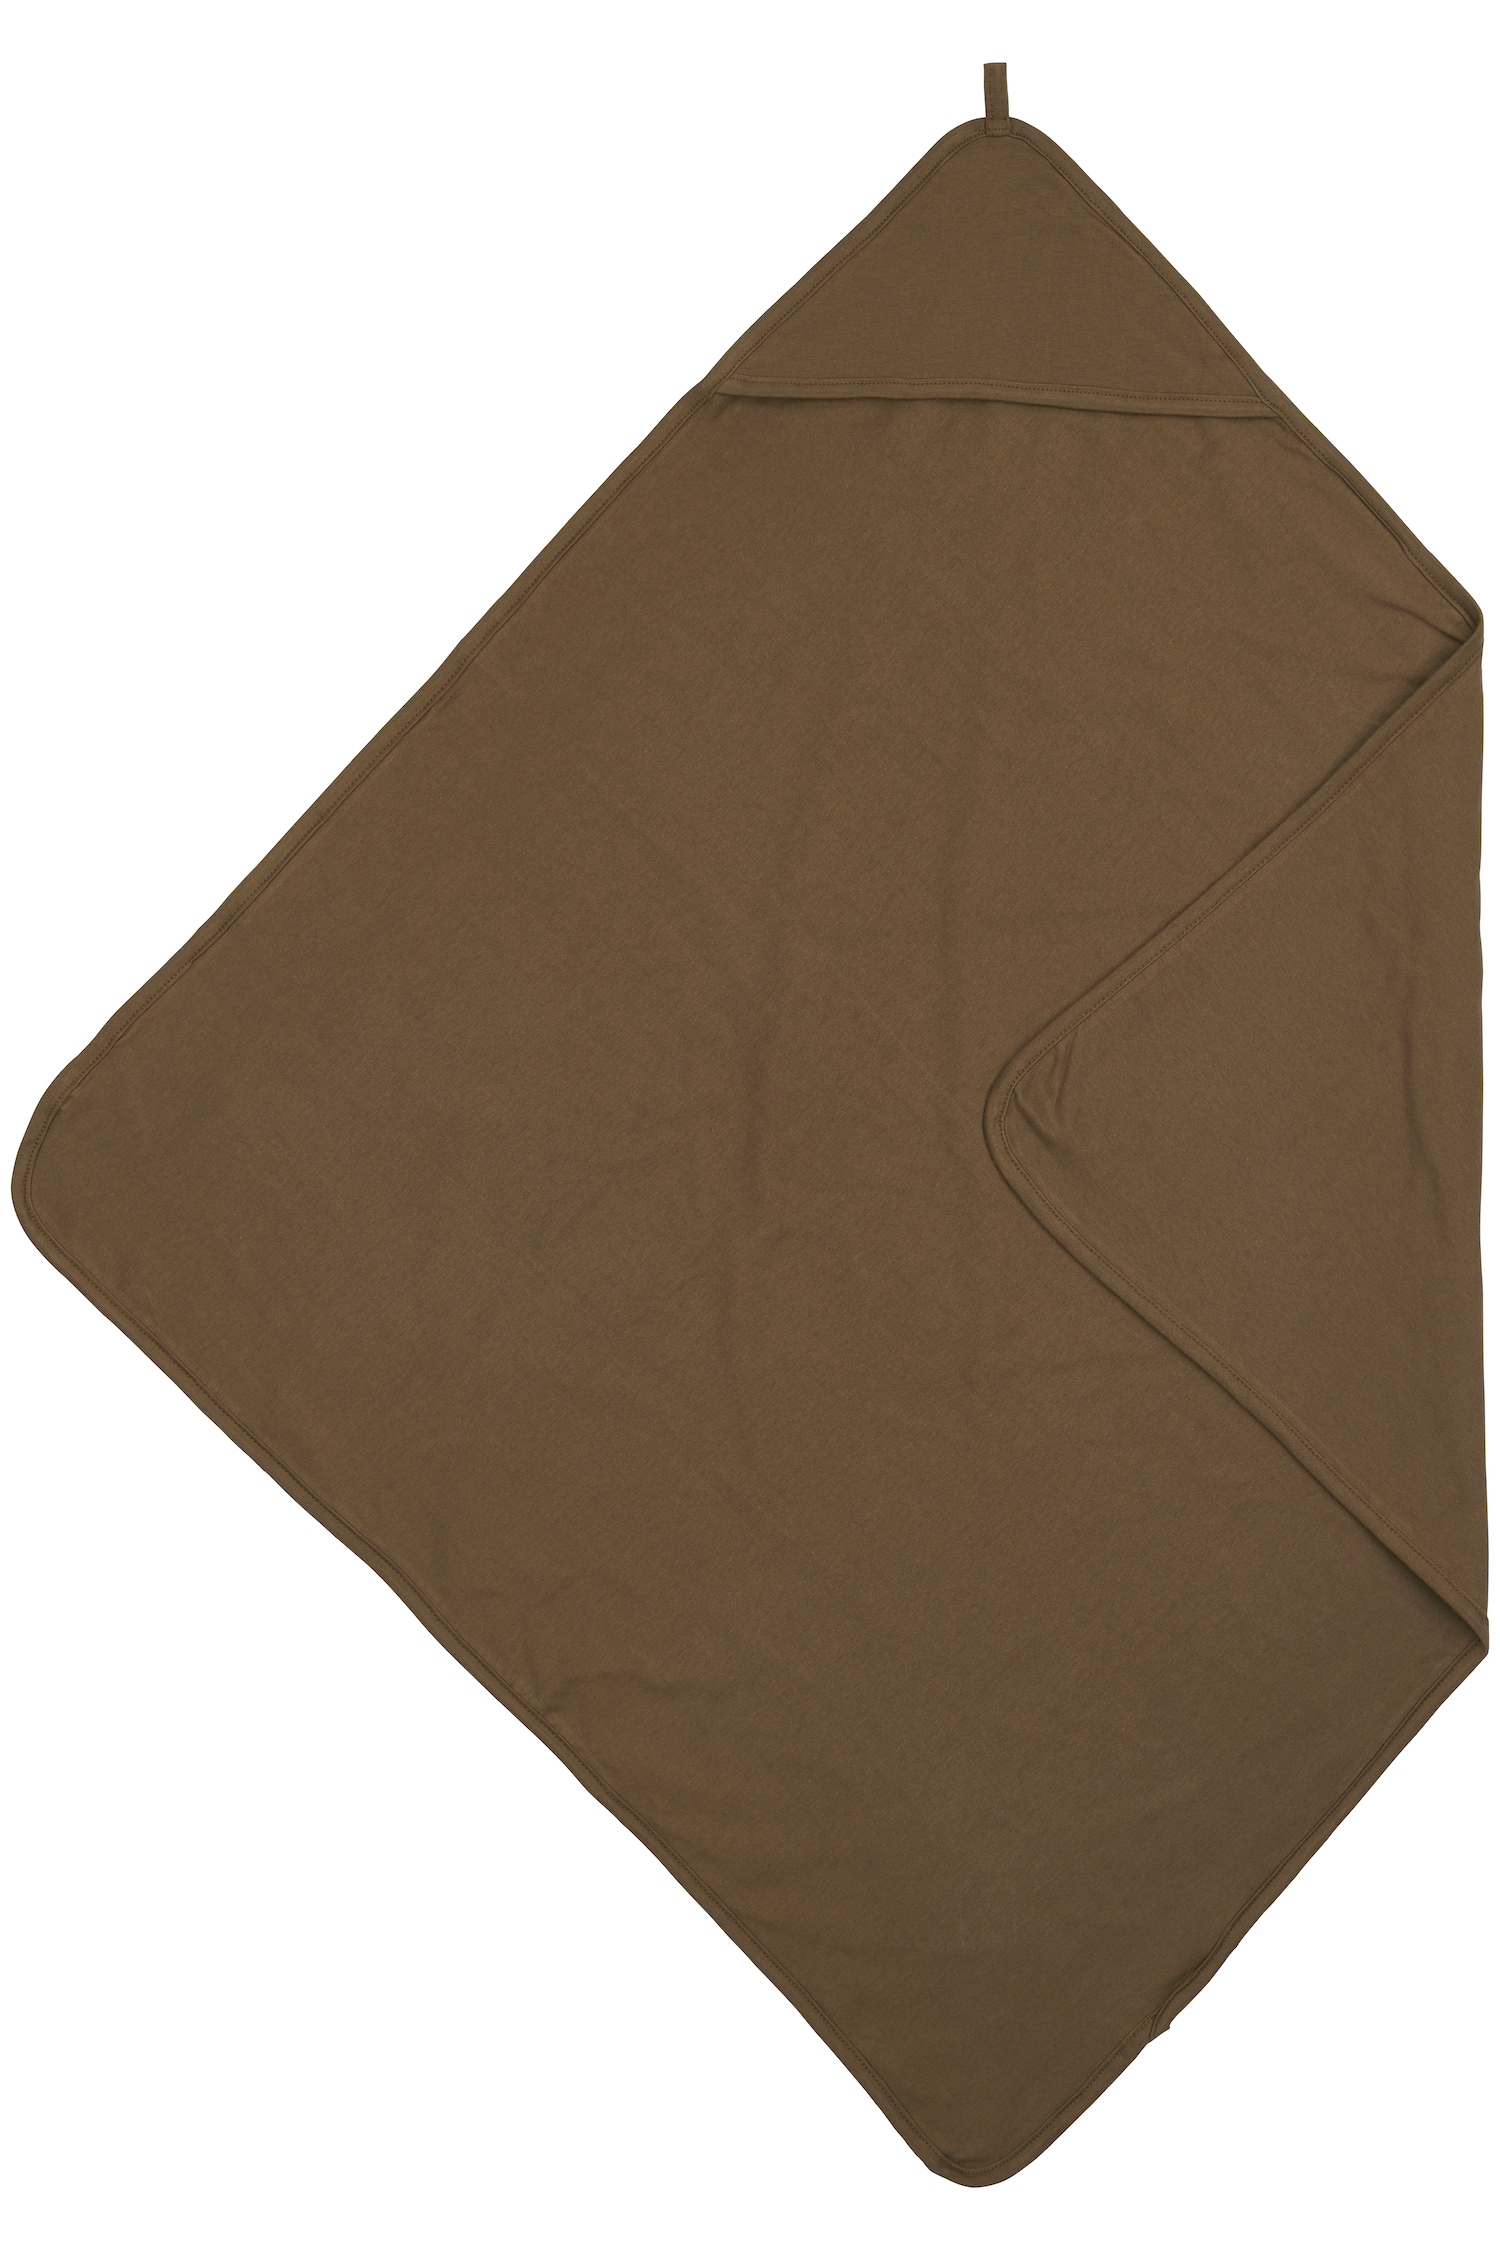 Kapuzentuch Basic Jersey - Chocolate - 80x80cm